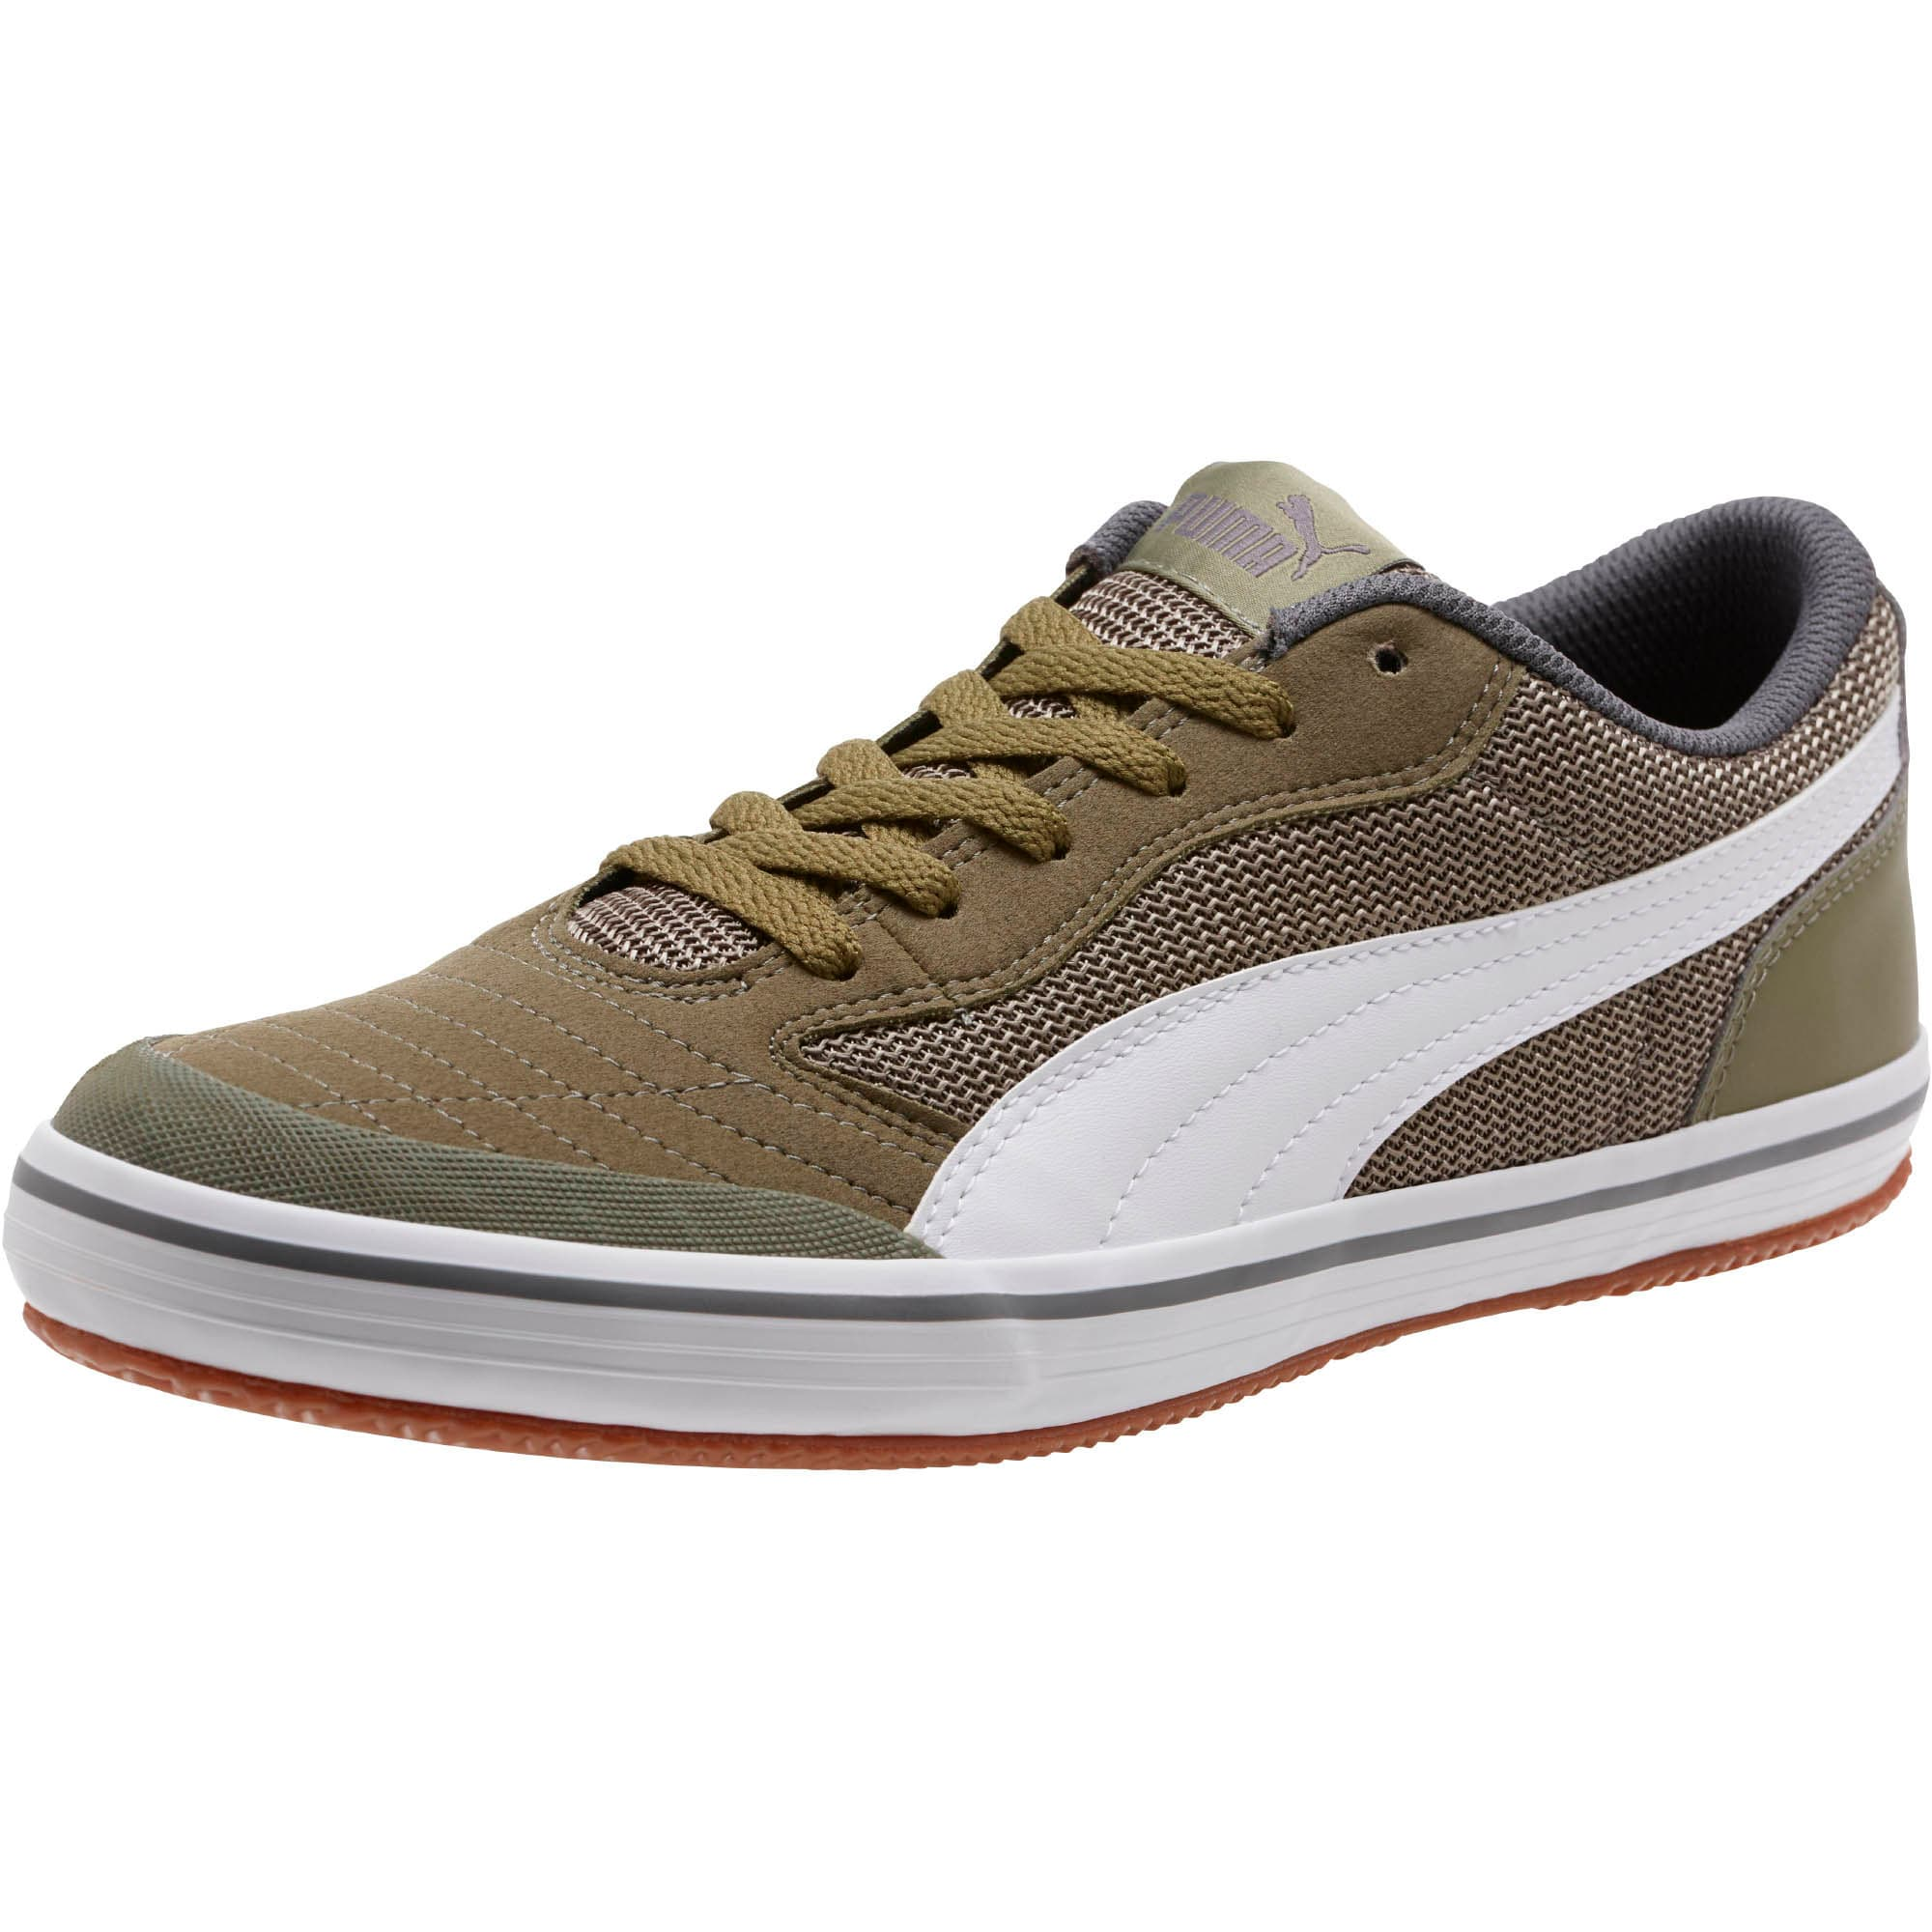 Thumbnail 1 of Astro Sala Sneakers, Burnt Olive-Puma White, medium